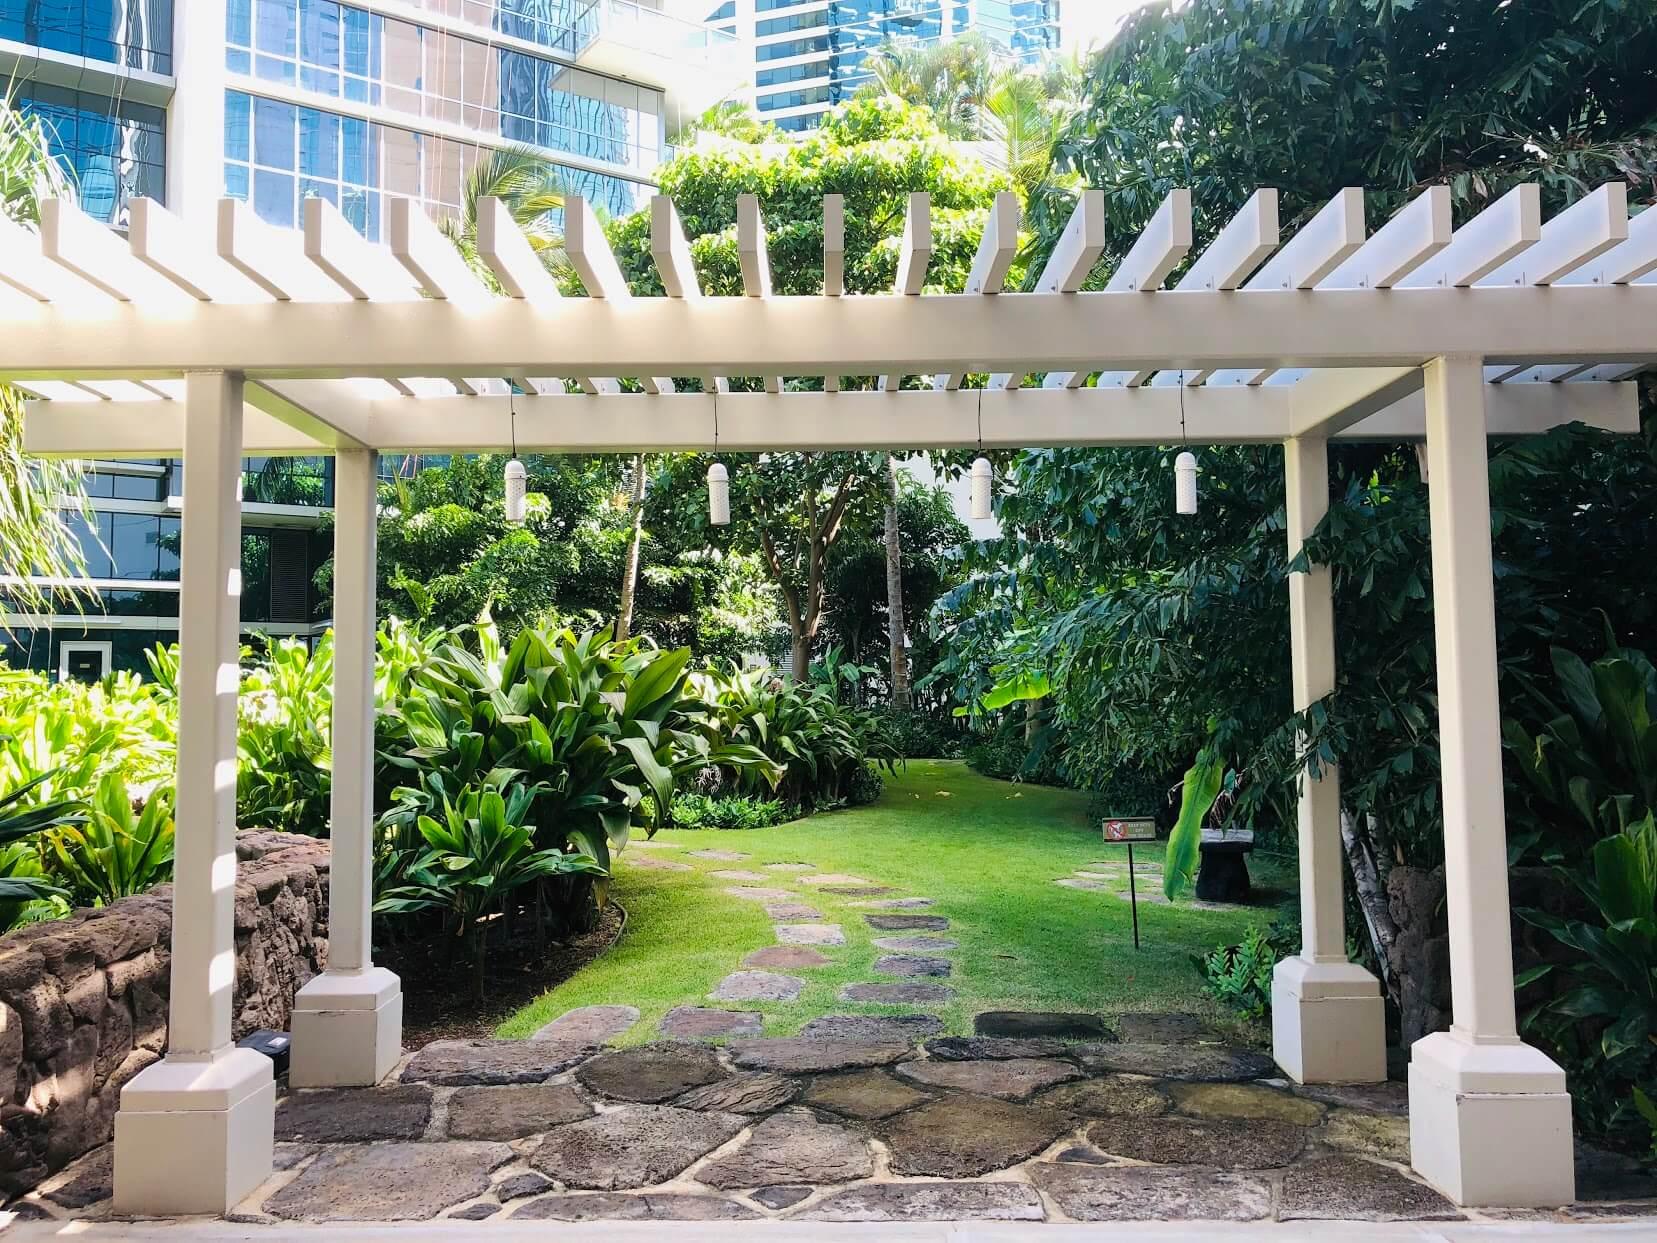 Waihonua at Kewaloの芝生